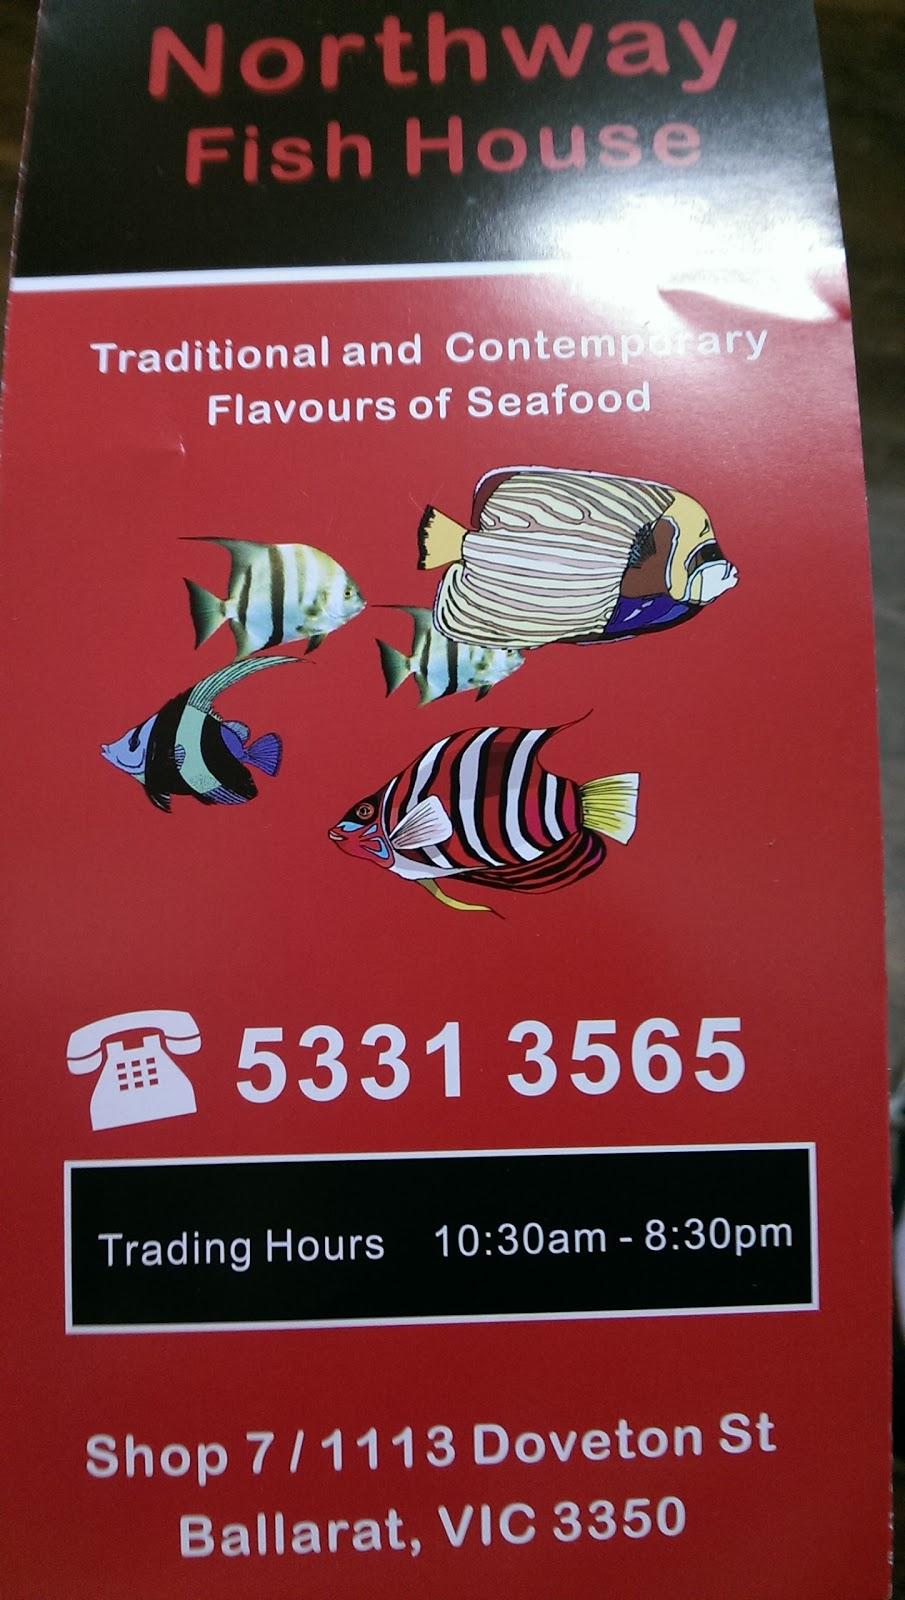 Northway Fish House | meal takeaway | 7/1113 Doveton St N, Ballarat North VIC 3350, Australia | 0353313565 OR +61 3 5331 3565